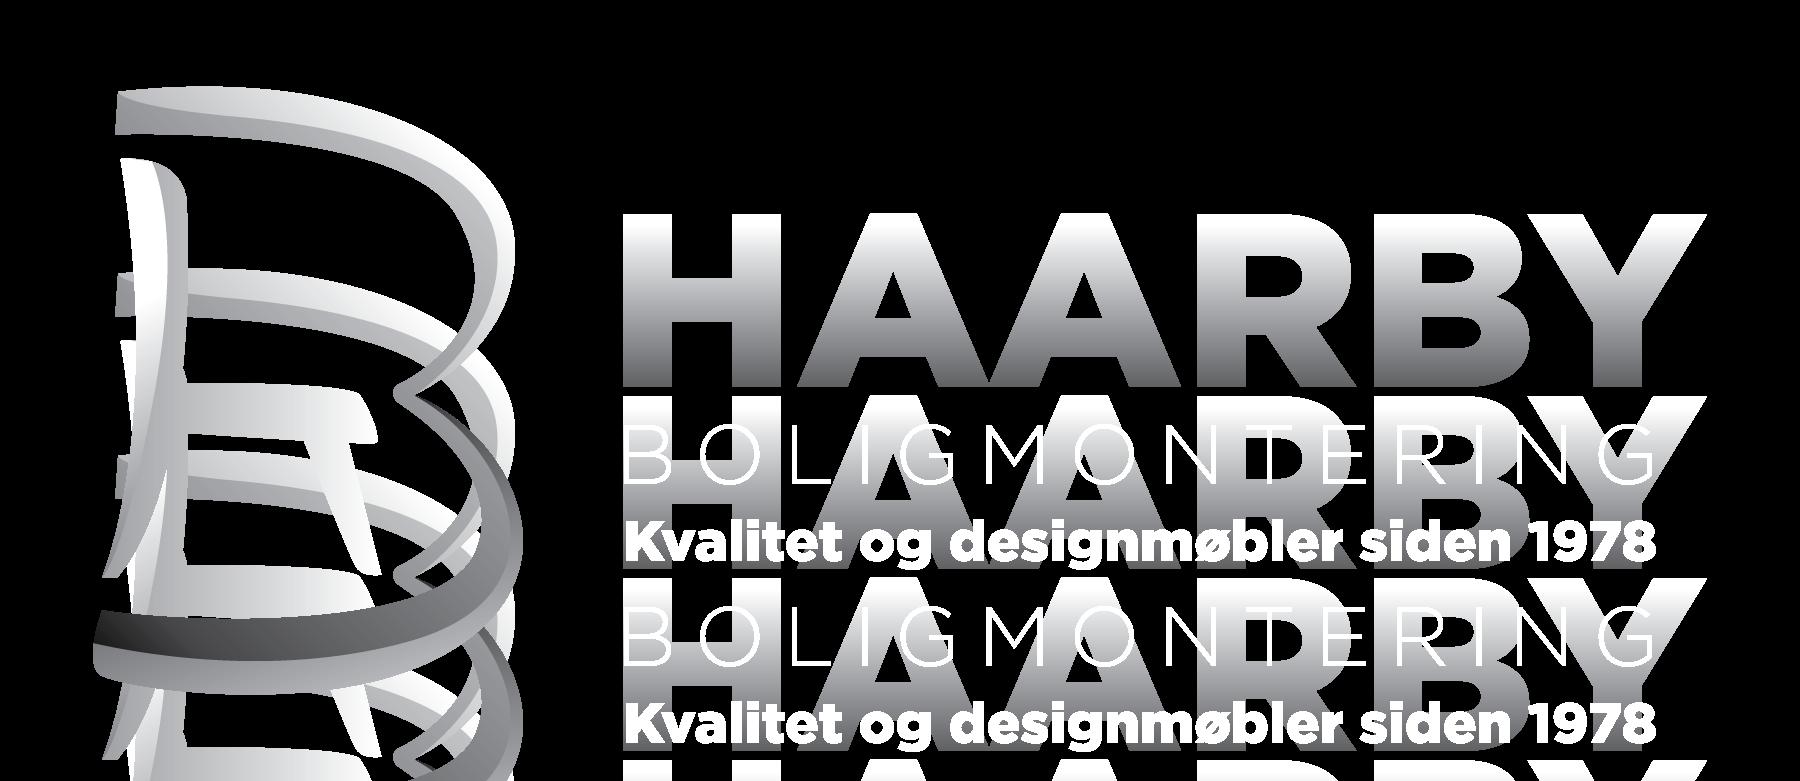 Haarby Boligmontering